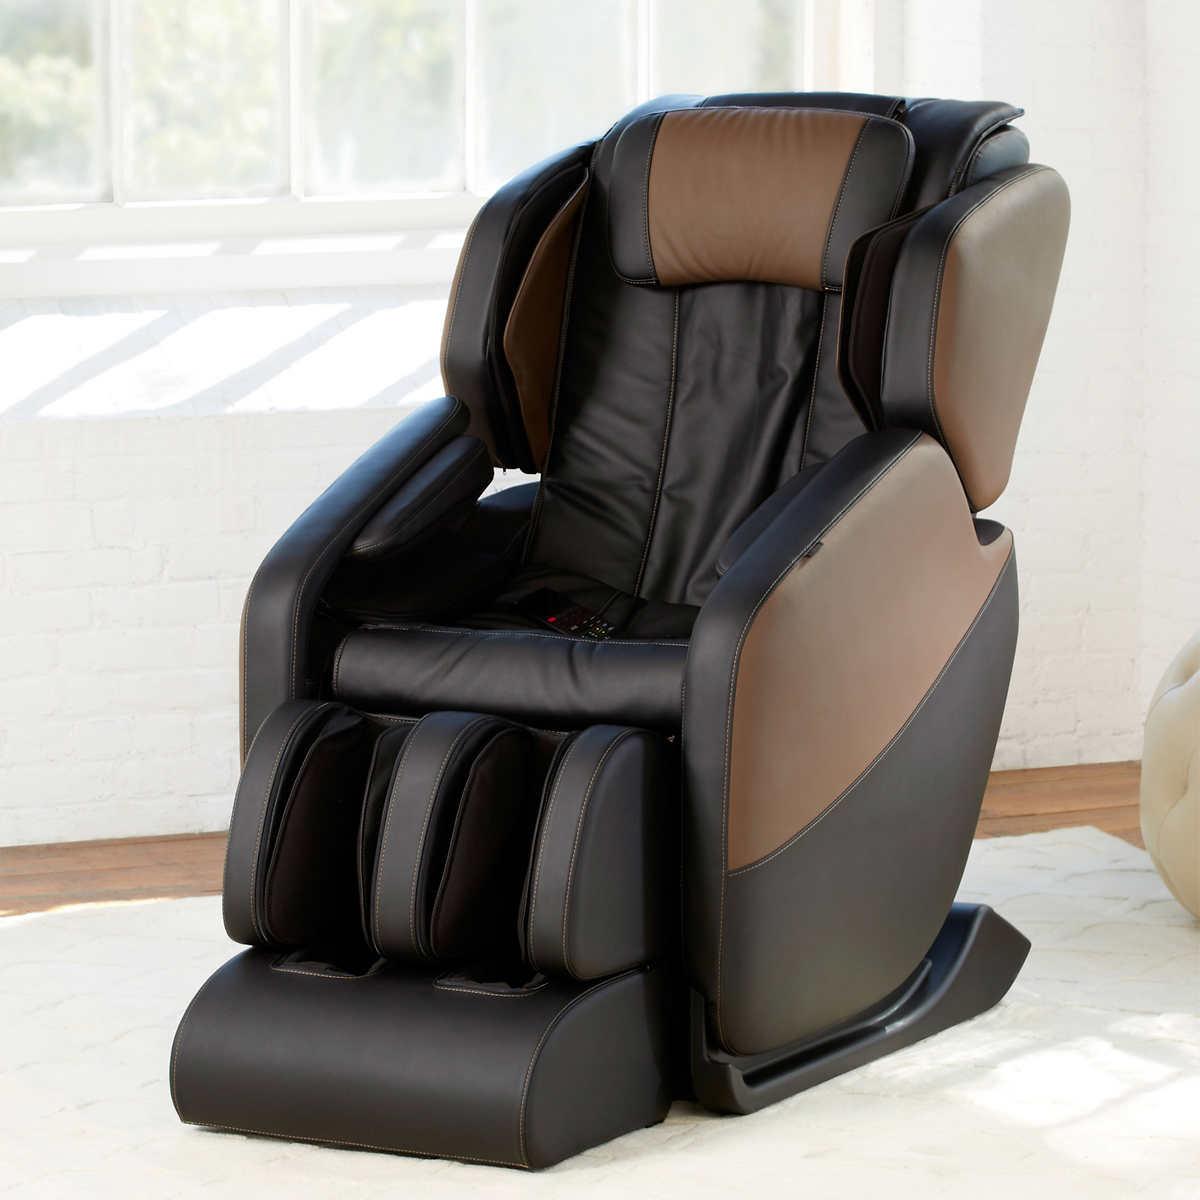 Zero gravity massage chairs - Brookstone Renew Zero Gravity Massage Chair Item 1060641 Click To Zoom